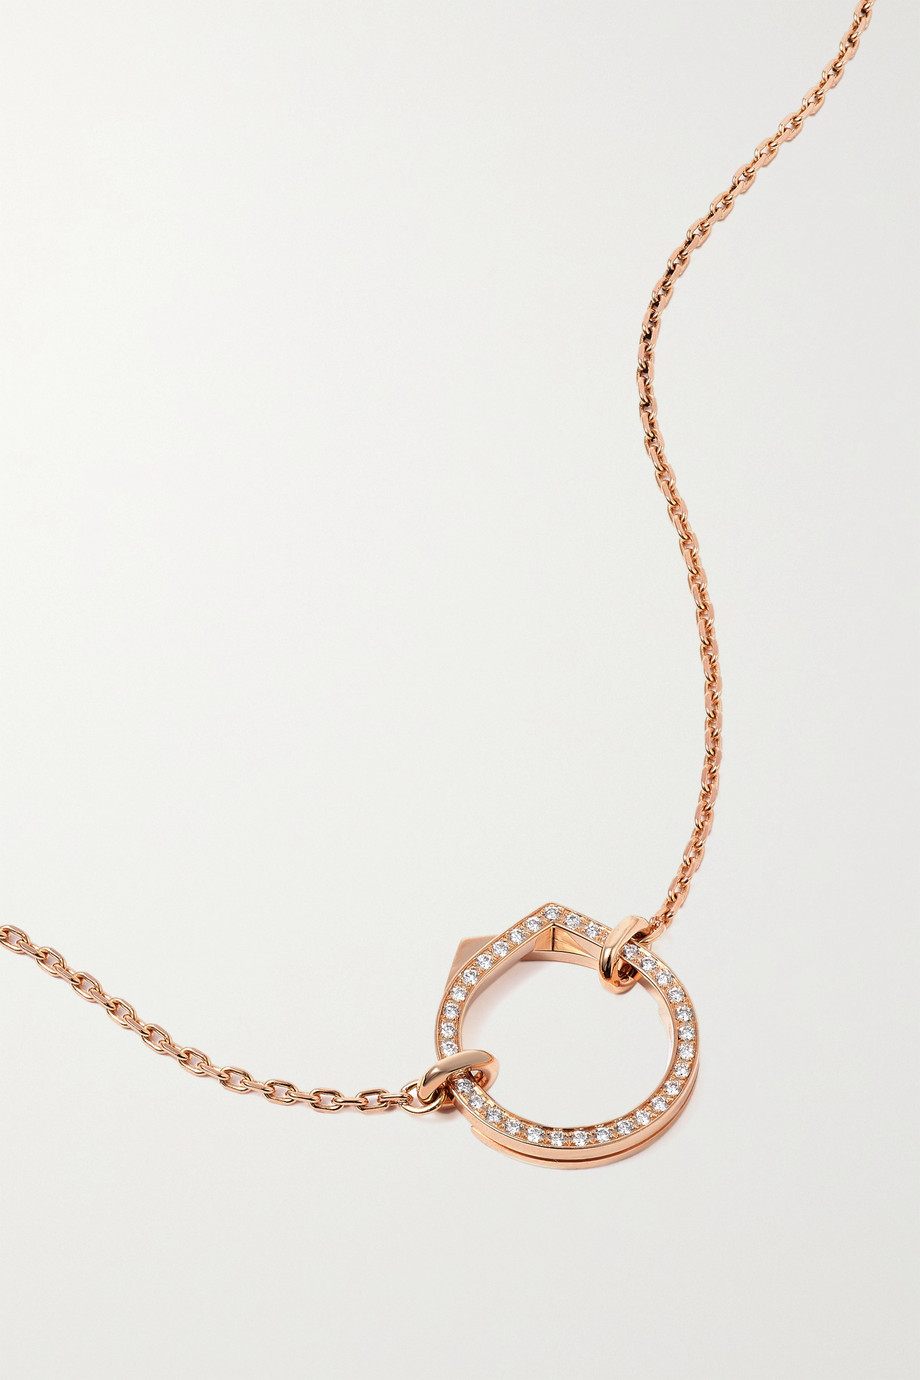 Repossi Collier en or rose 18 carats (750/1000) et diamants